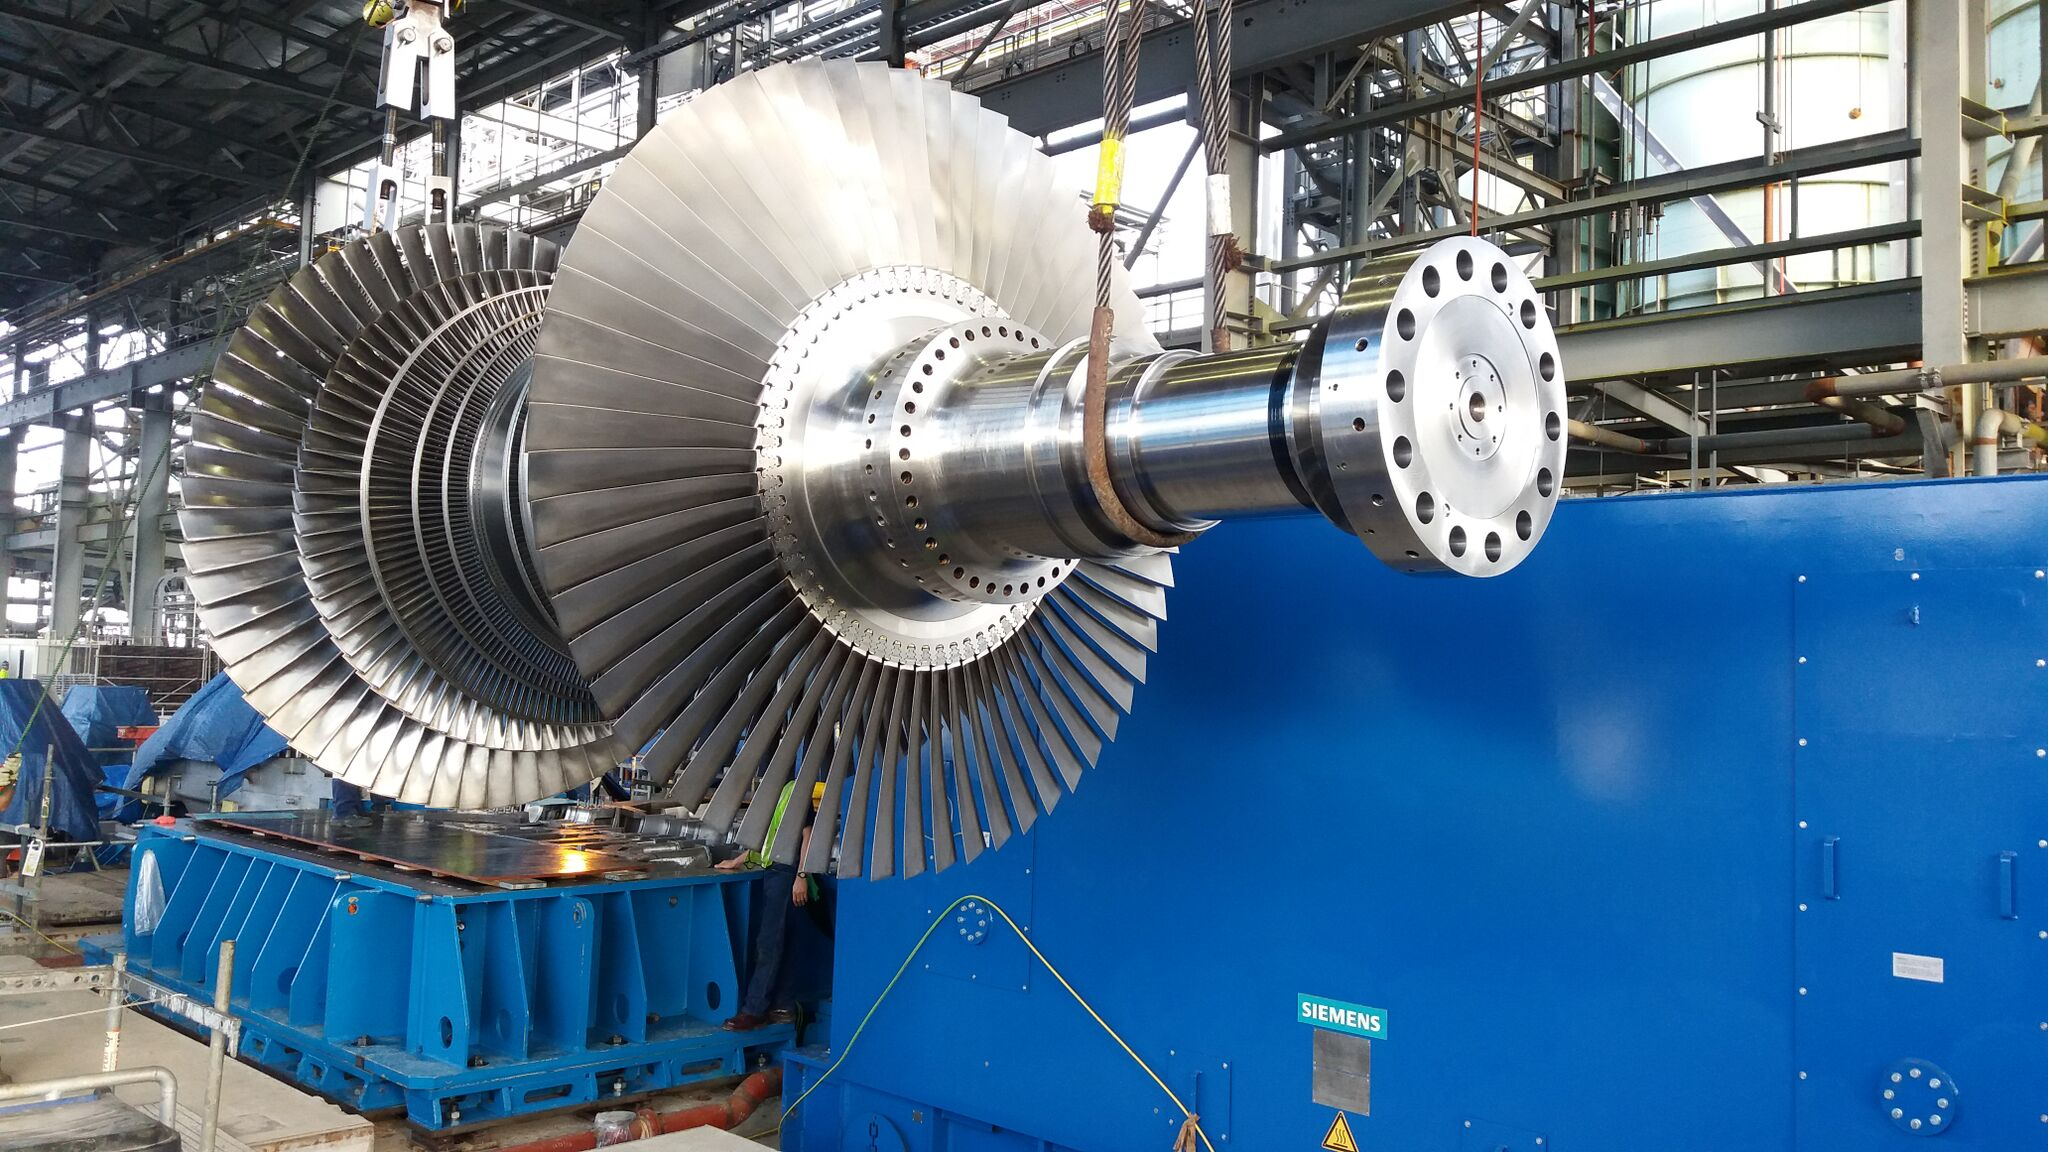 Inspection of new LP turbine